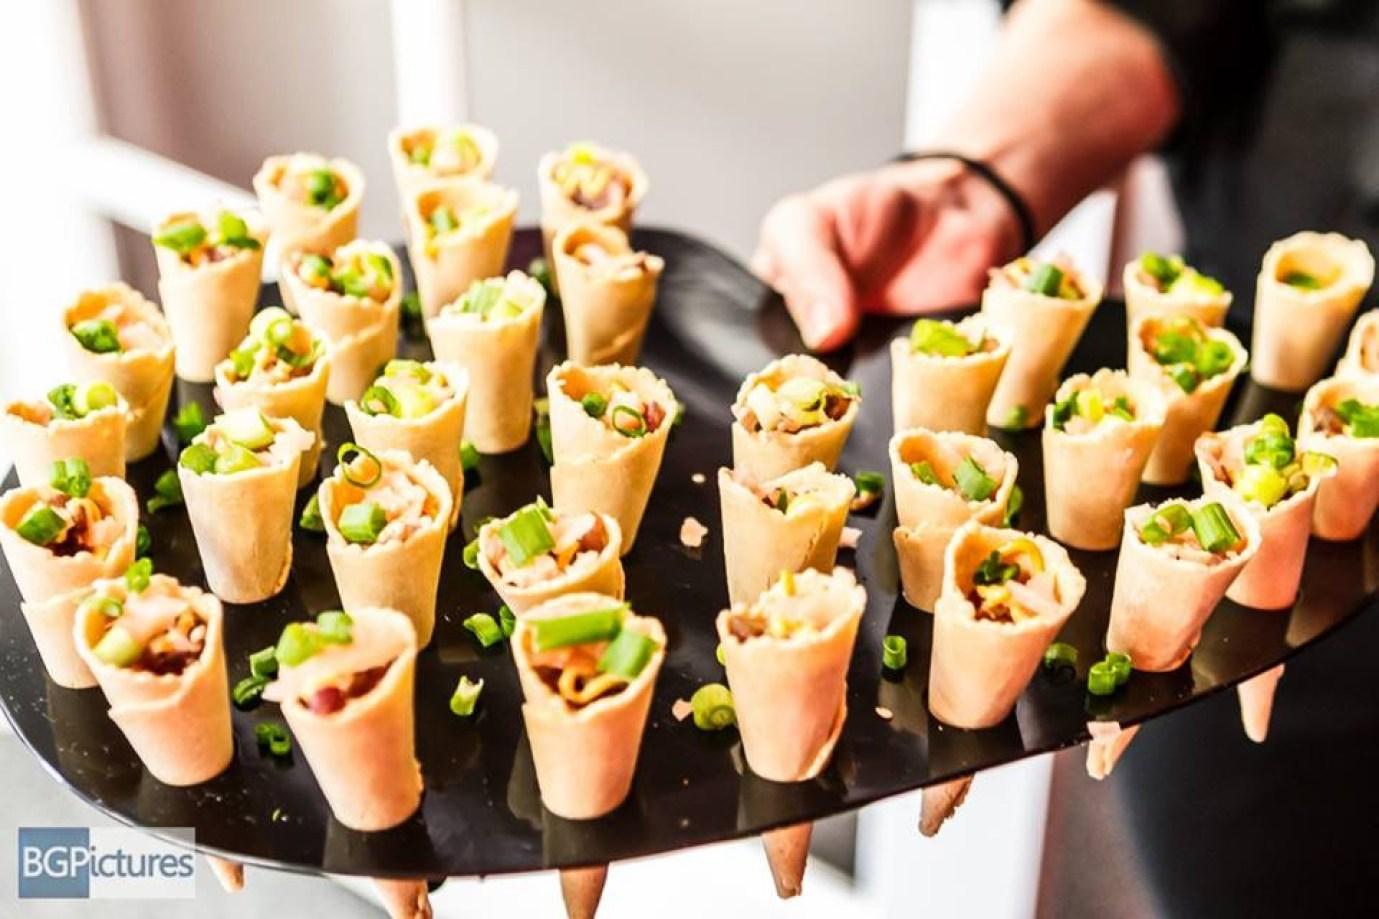 Italian Seafood Salad Served in Mini Savory Cones